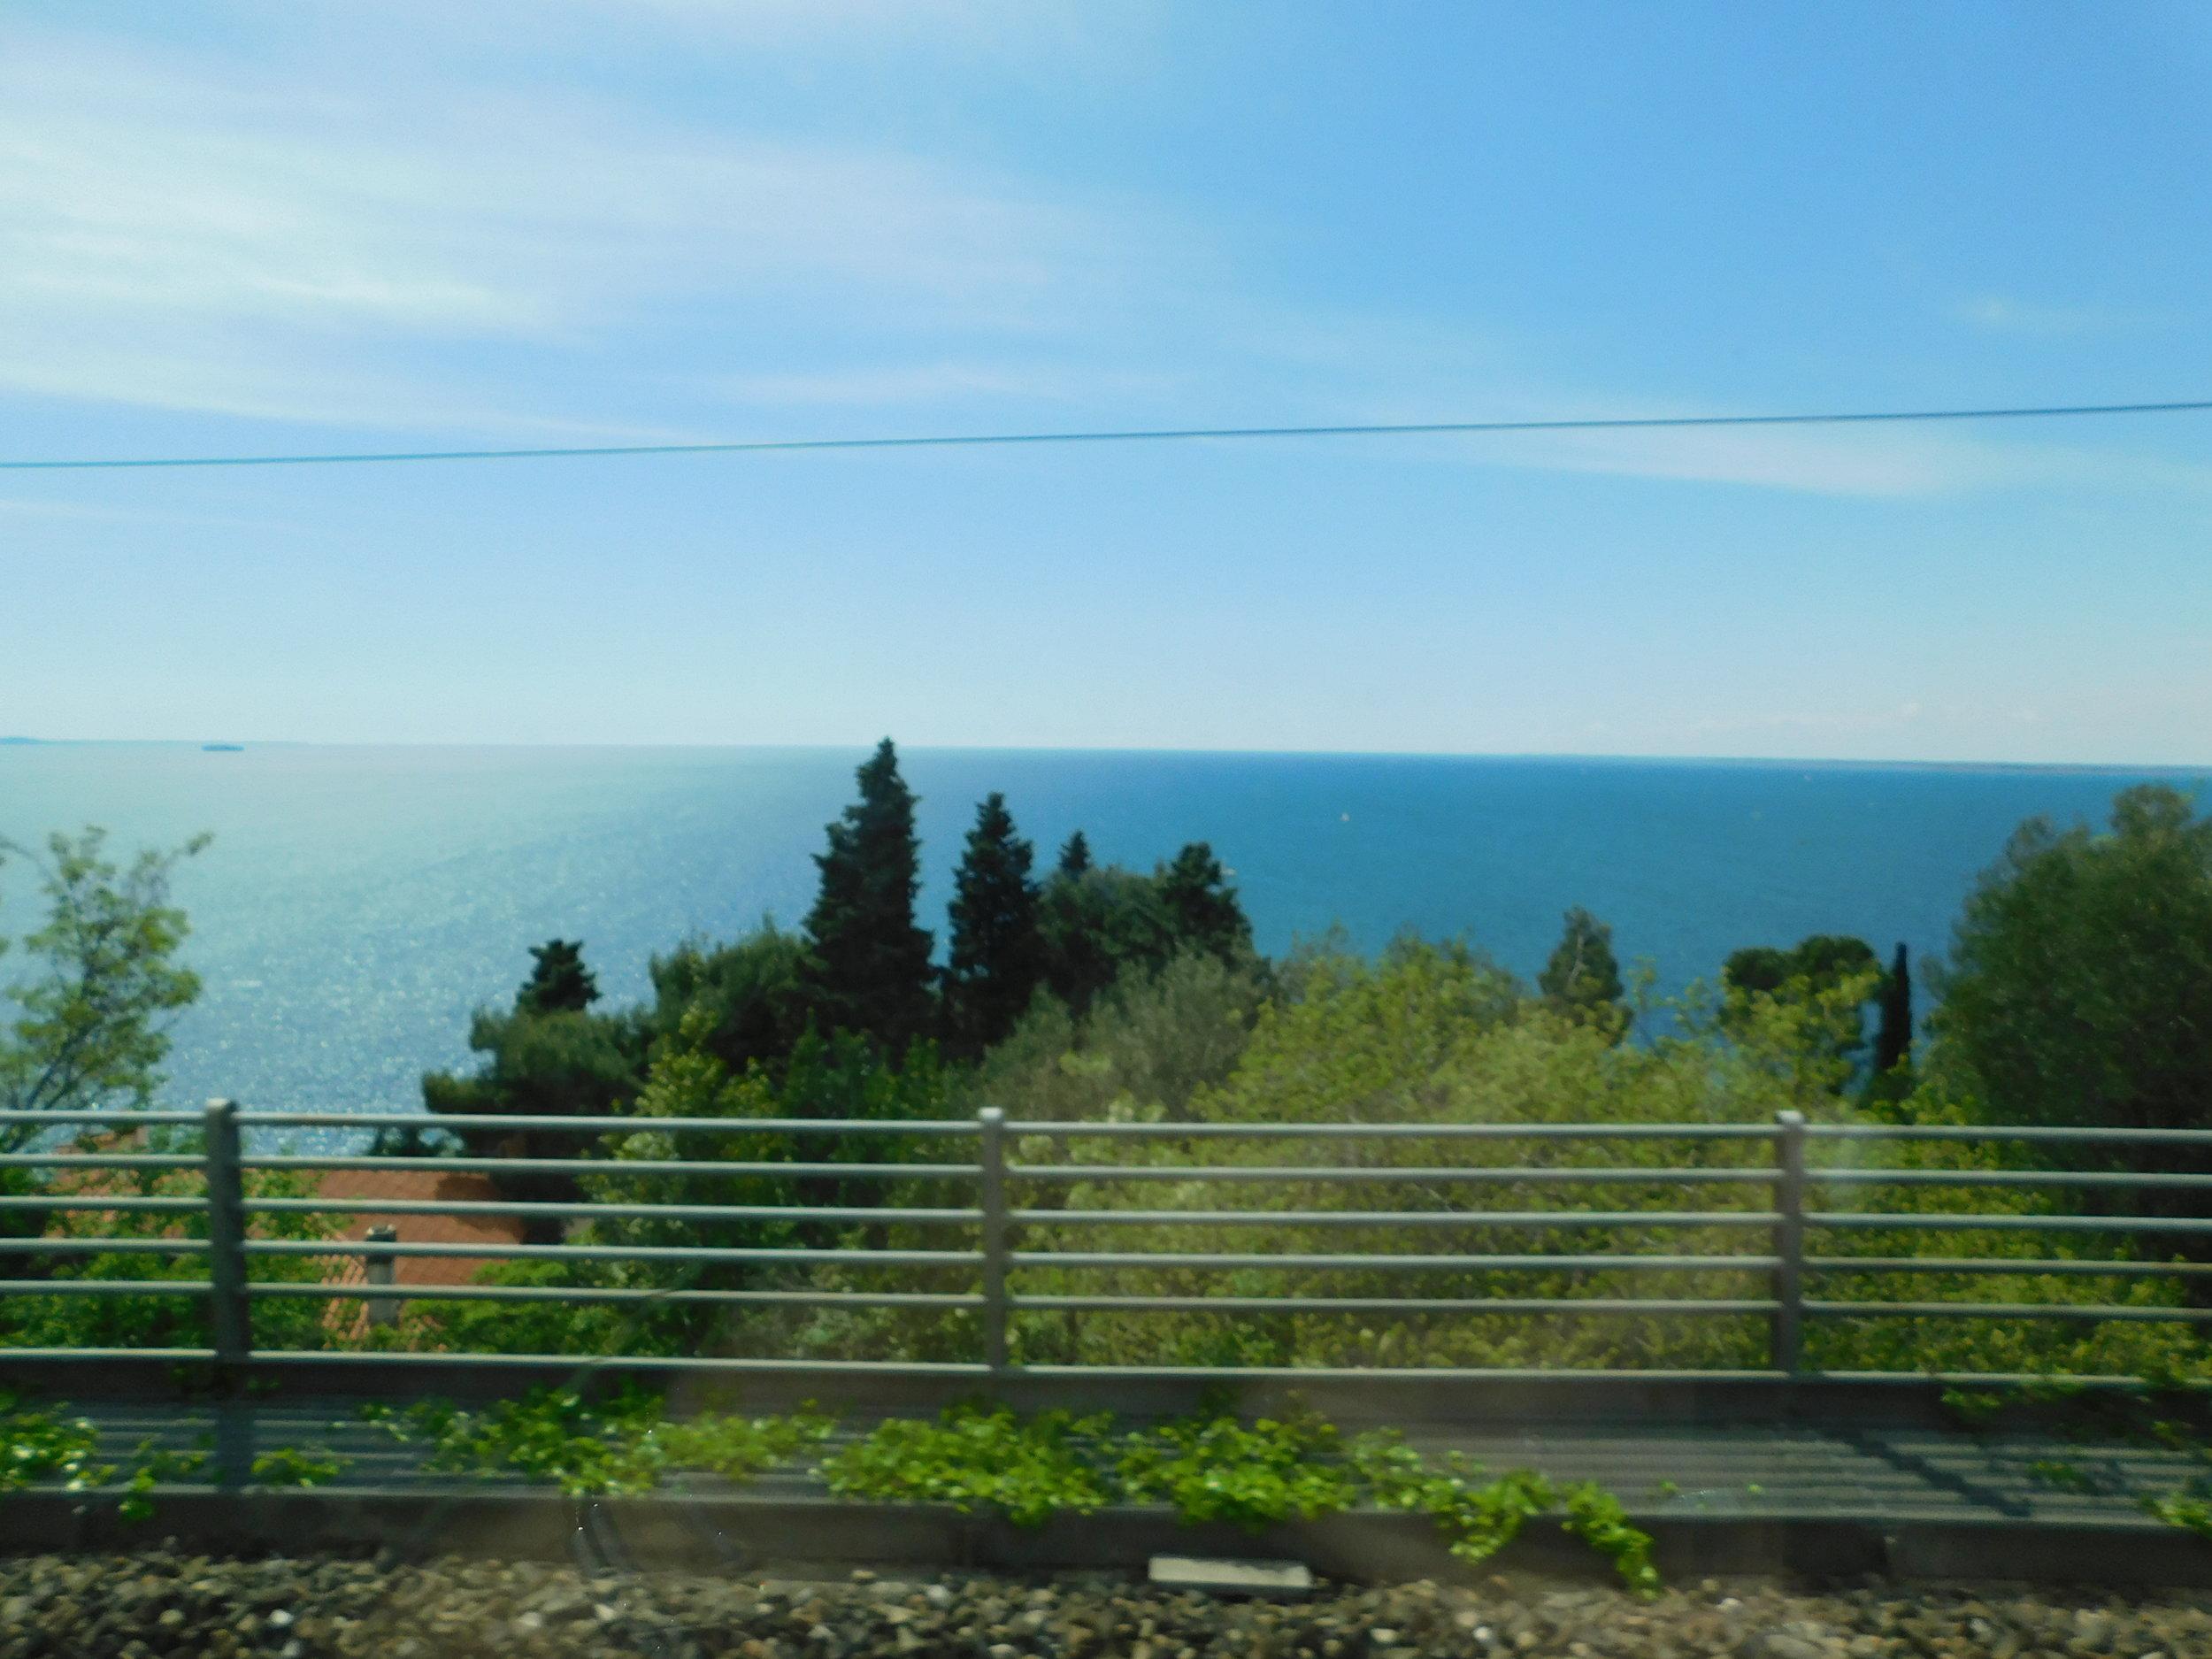 The Dalmatian Coastline from a bus between Trieste, Italy & Zadar, Croatia